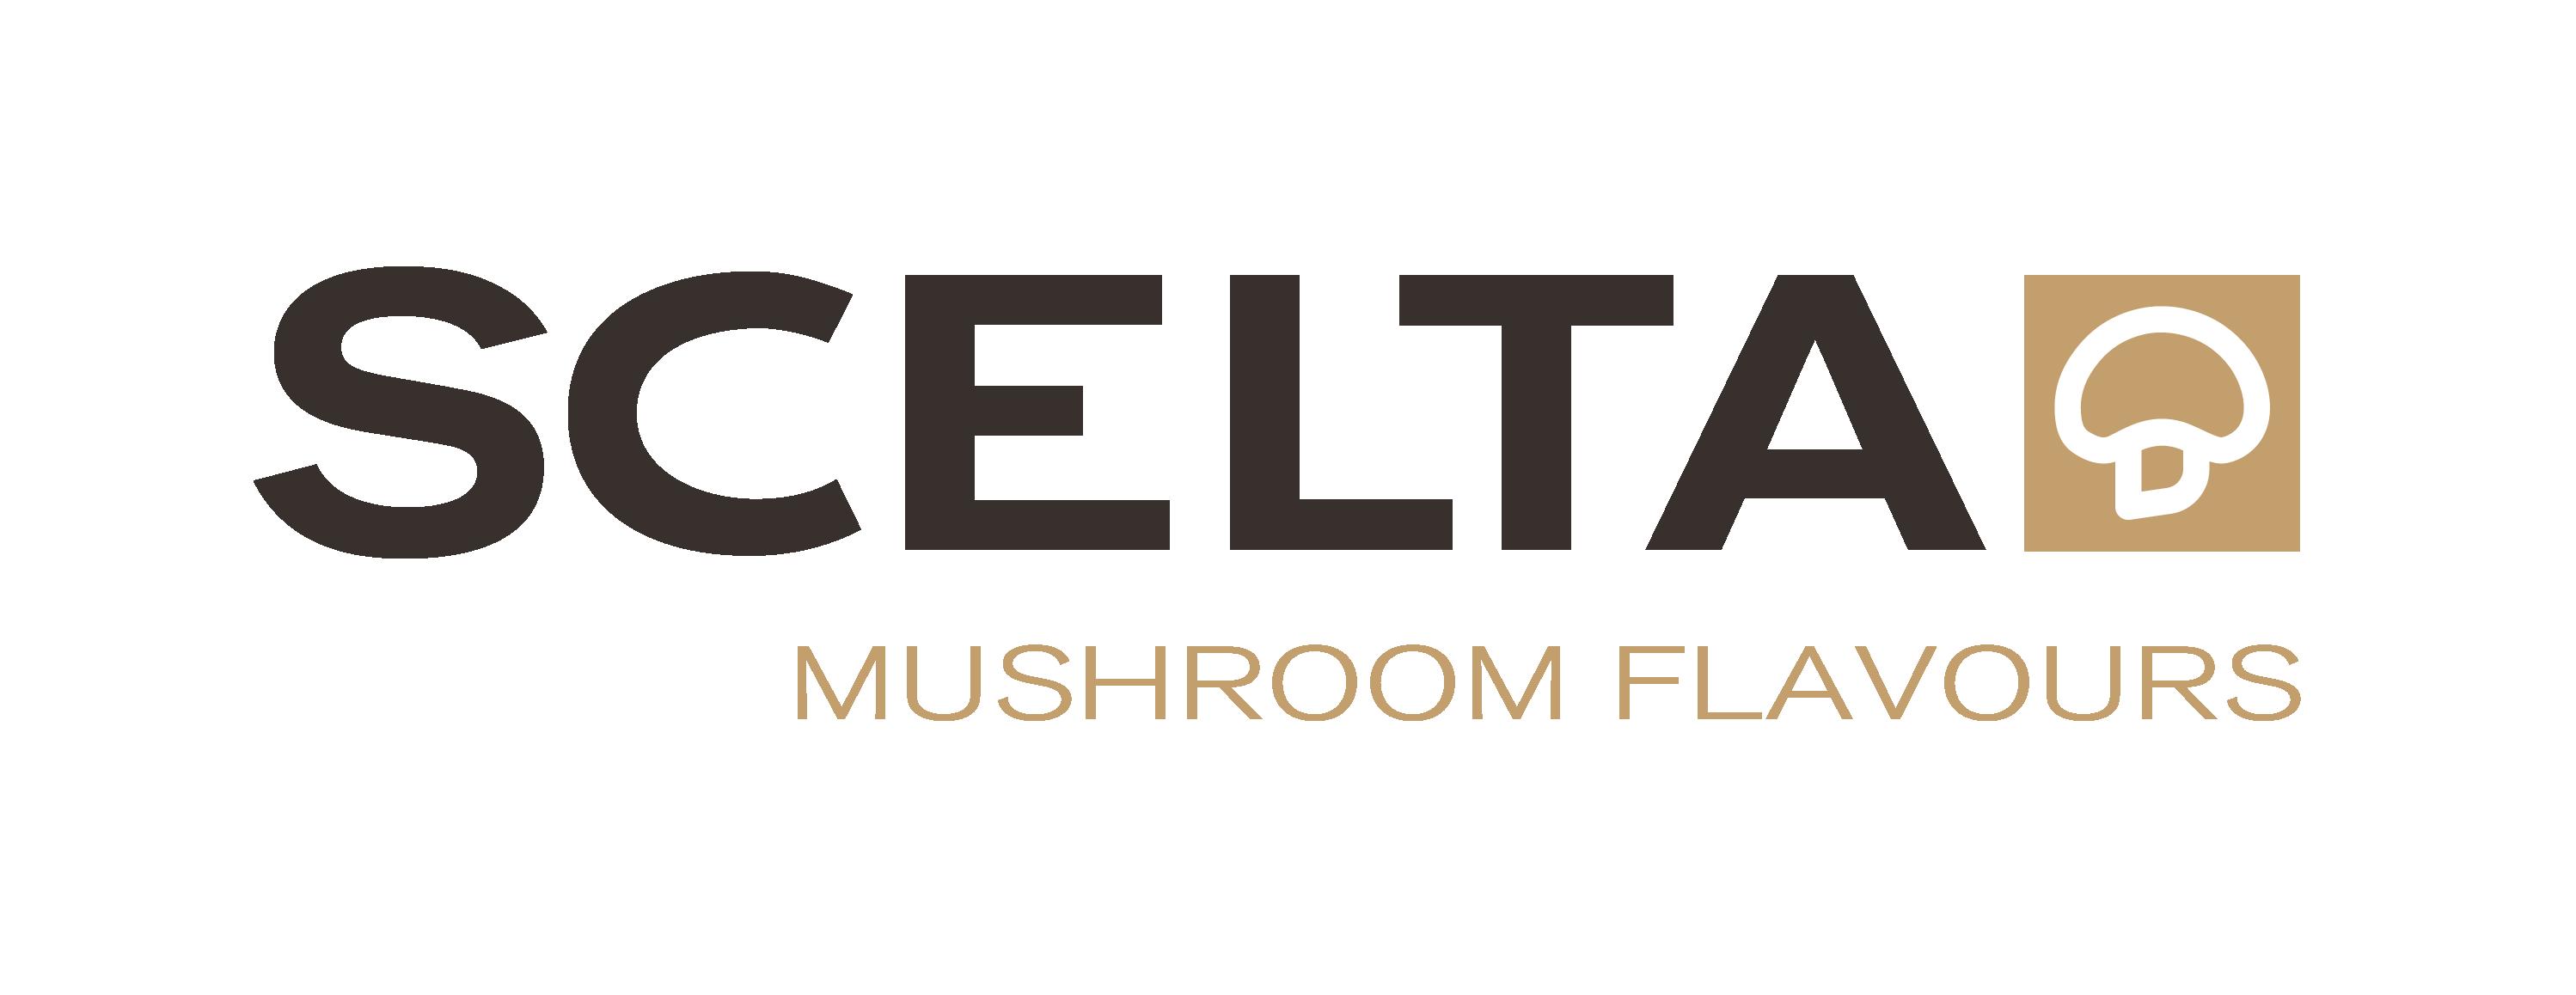 s-RGB SCELTA Mushroom flavours logo positif 288 ppi